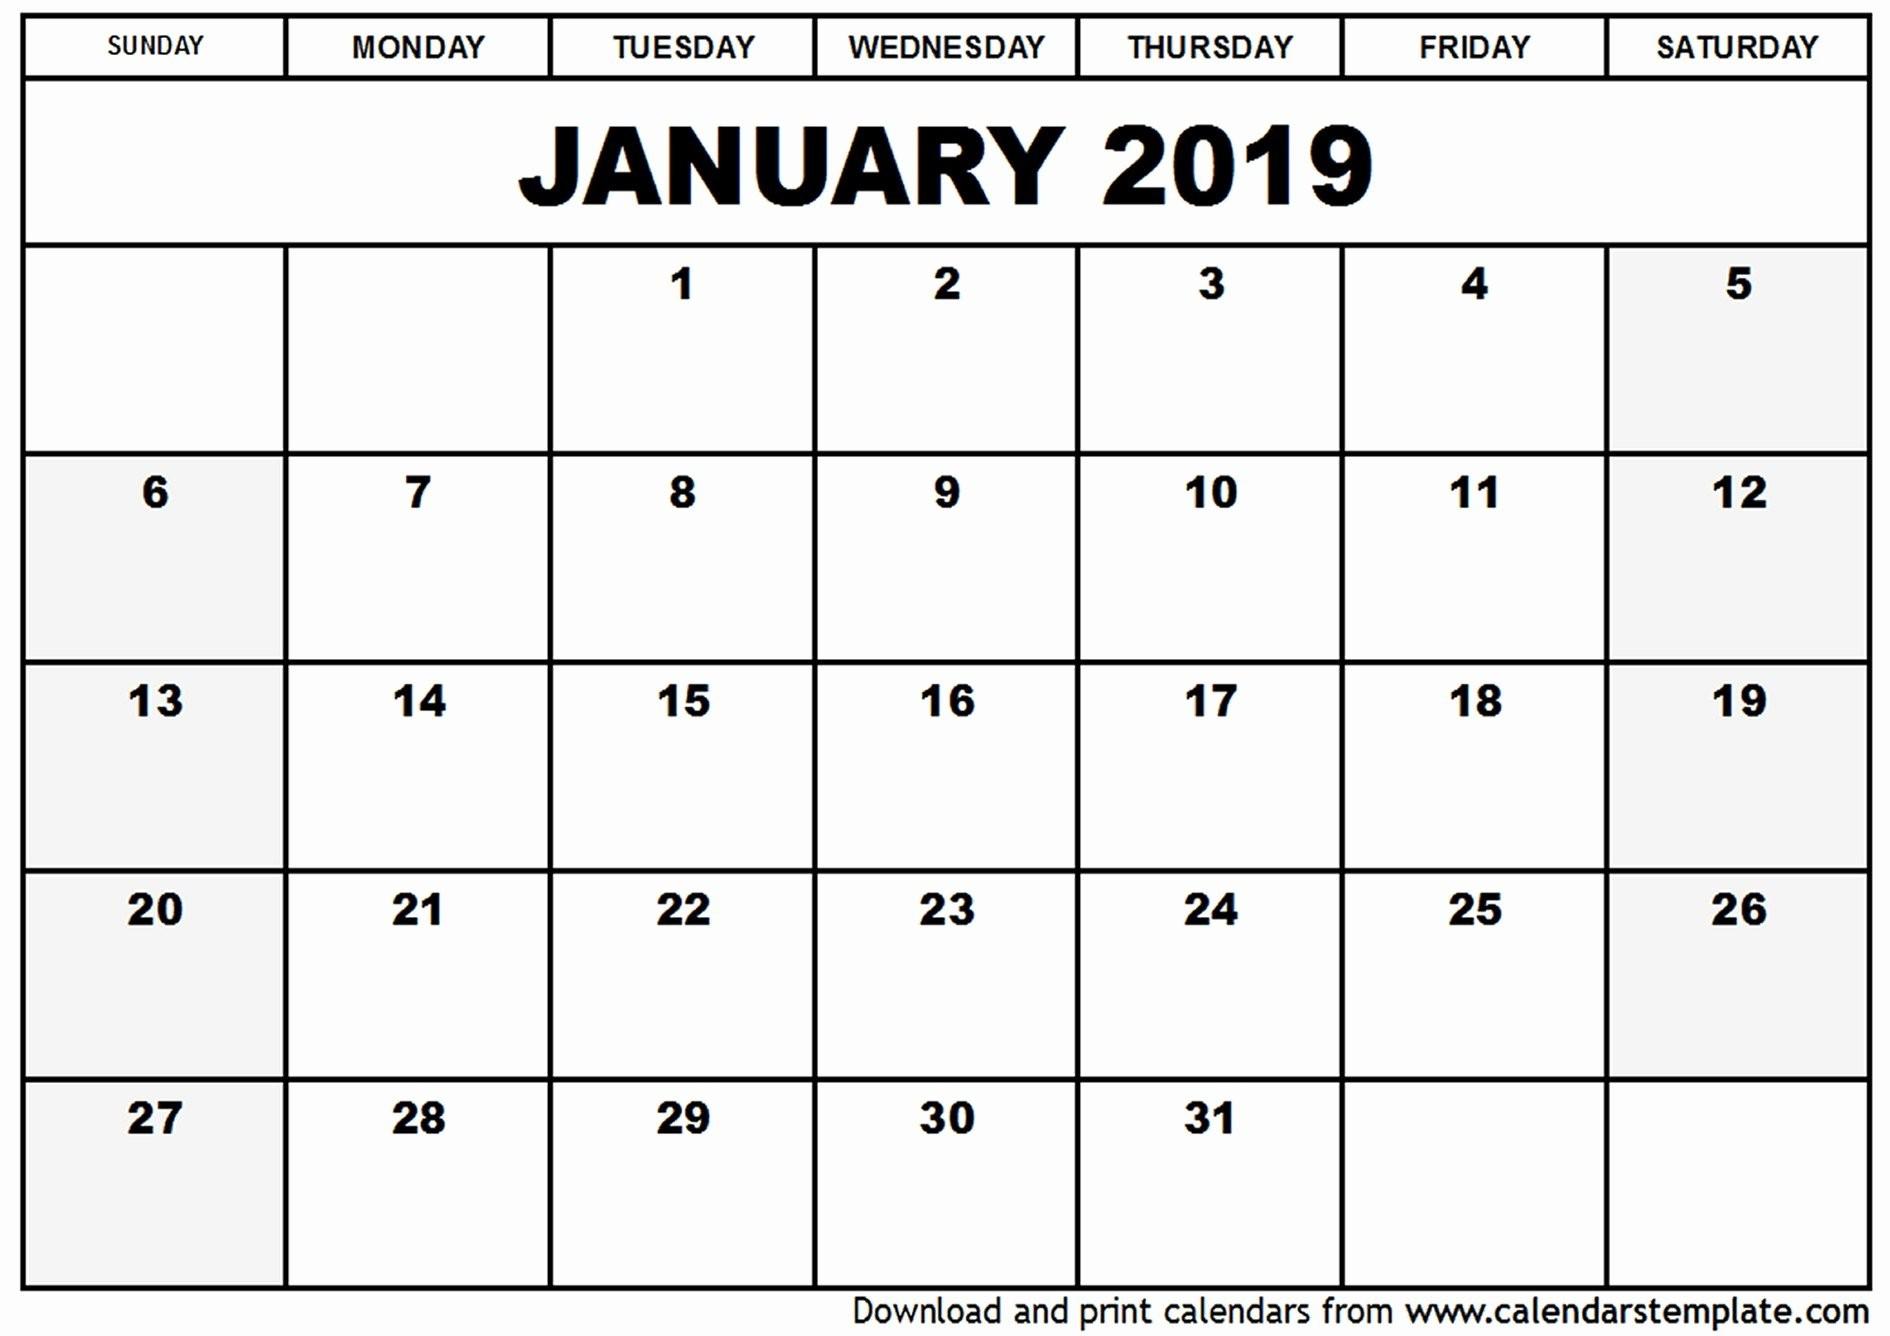 Free Printable Calendar Labs 2019 | Printable Calendar 2020